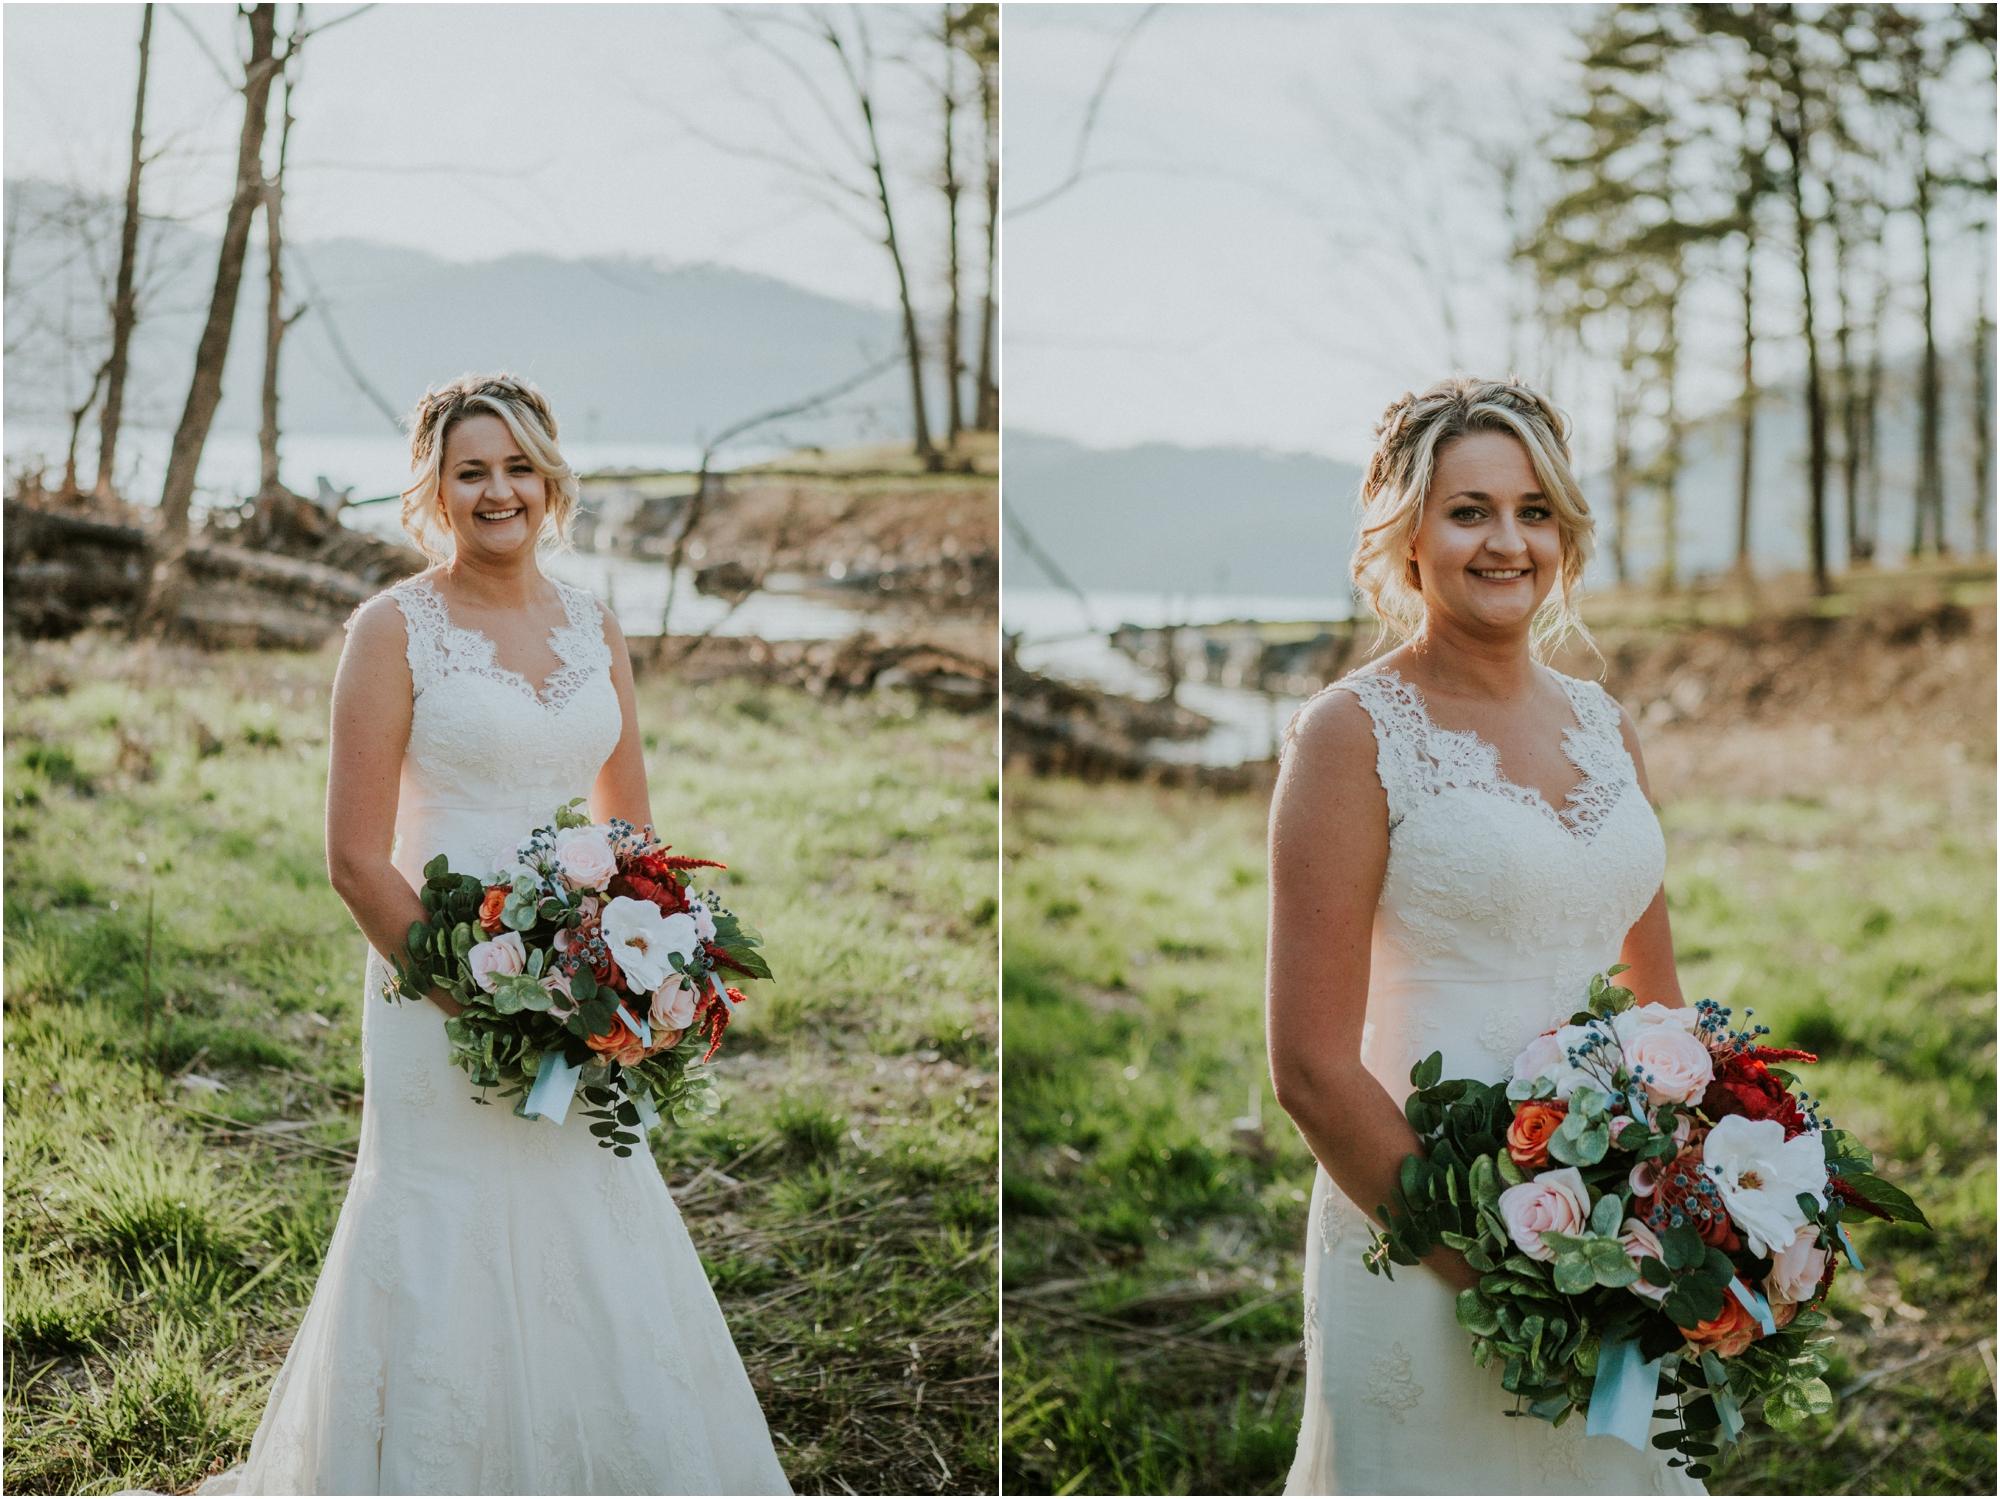 watauga-lake--bohemian-bridal-styled-session-northeast-tennessee-wedding-elopement-photography_0004.jpg